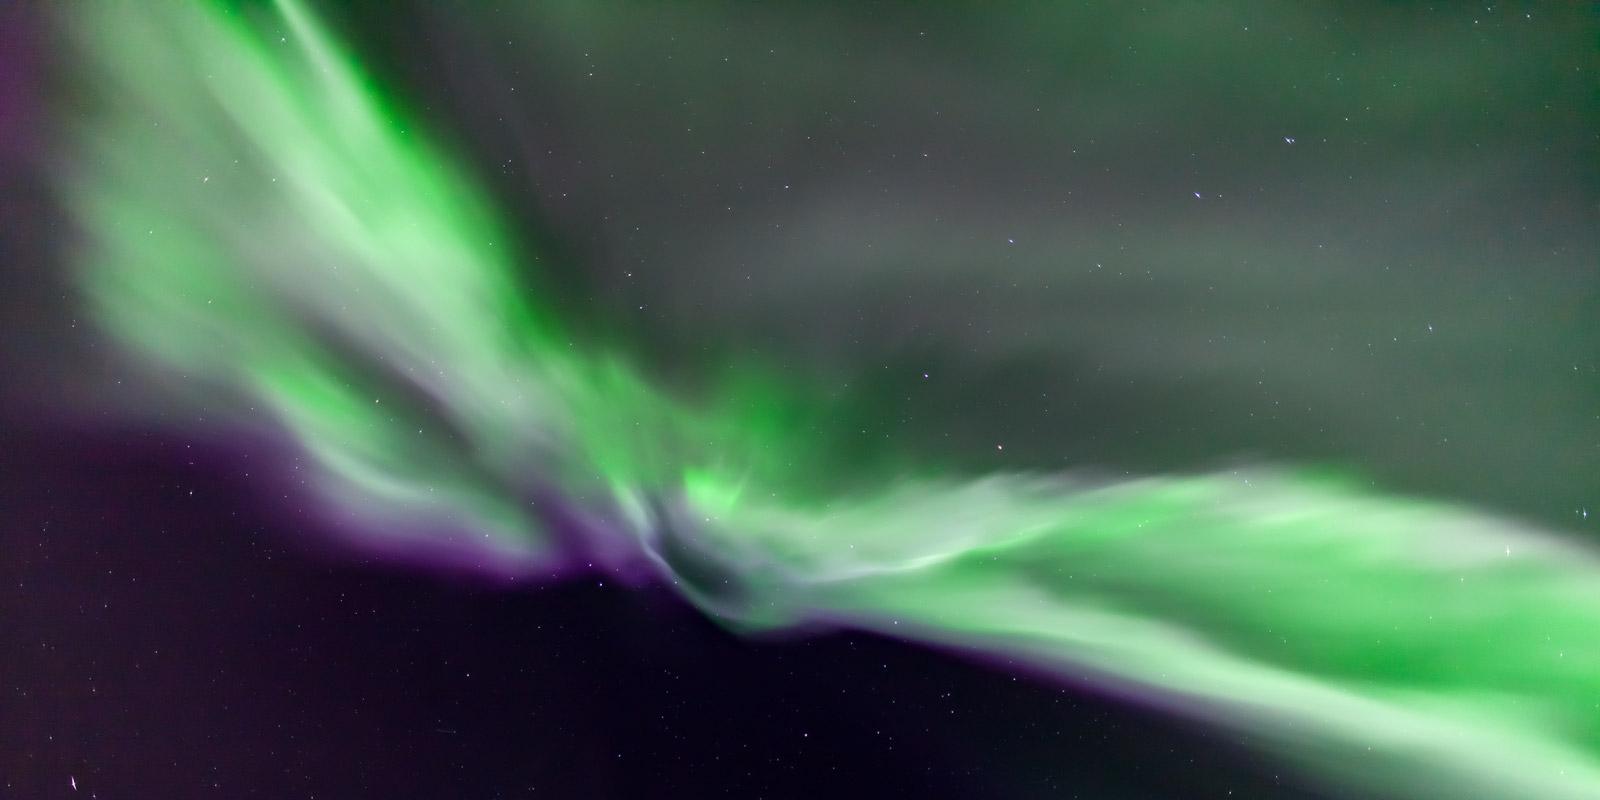 Alaska, Northern Lights, aurora, limited edition, photograph, fine art, landscape, photo